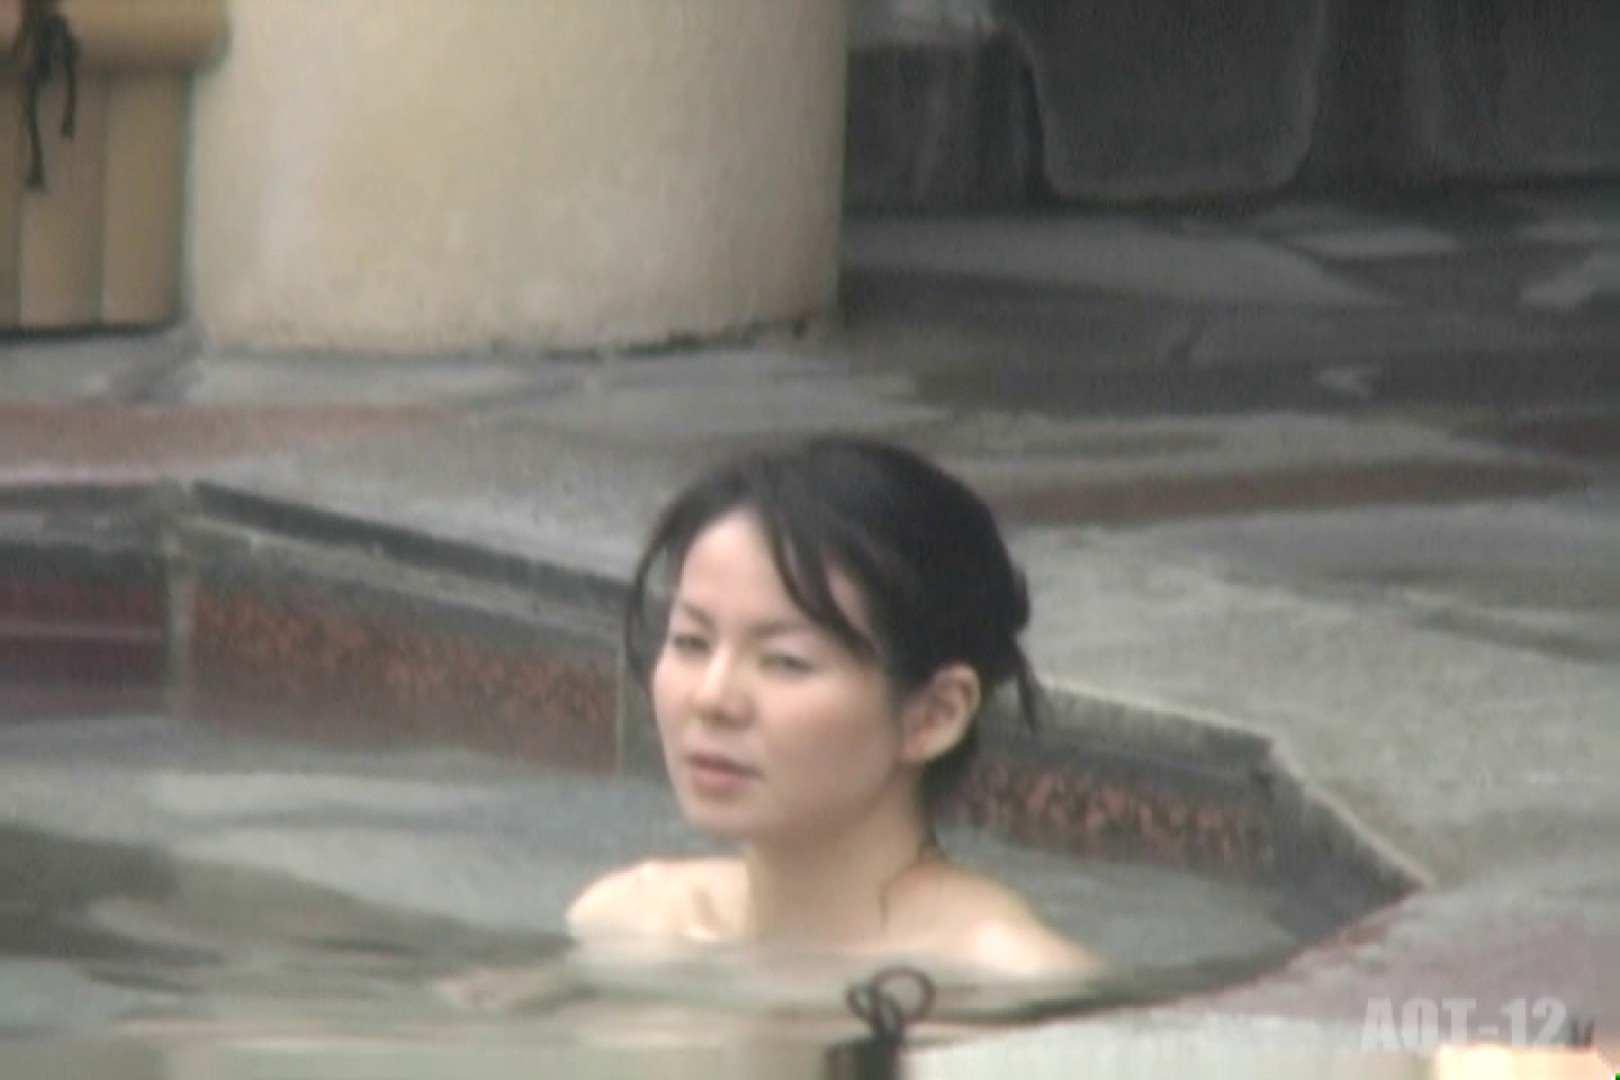 Aquaな露天風呂Vol.811 露天風呂編 | 盗撮シリーズ  75PIX 19